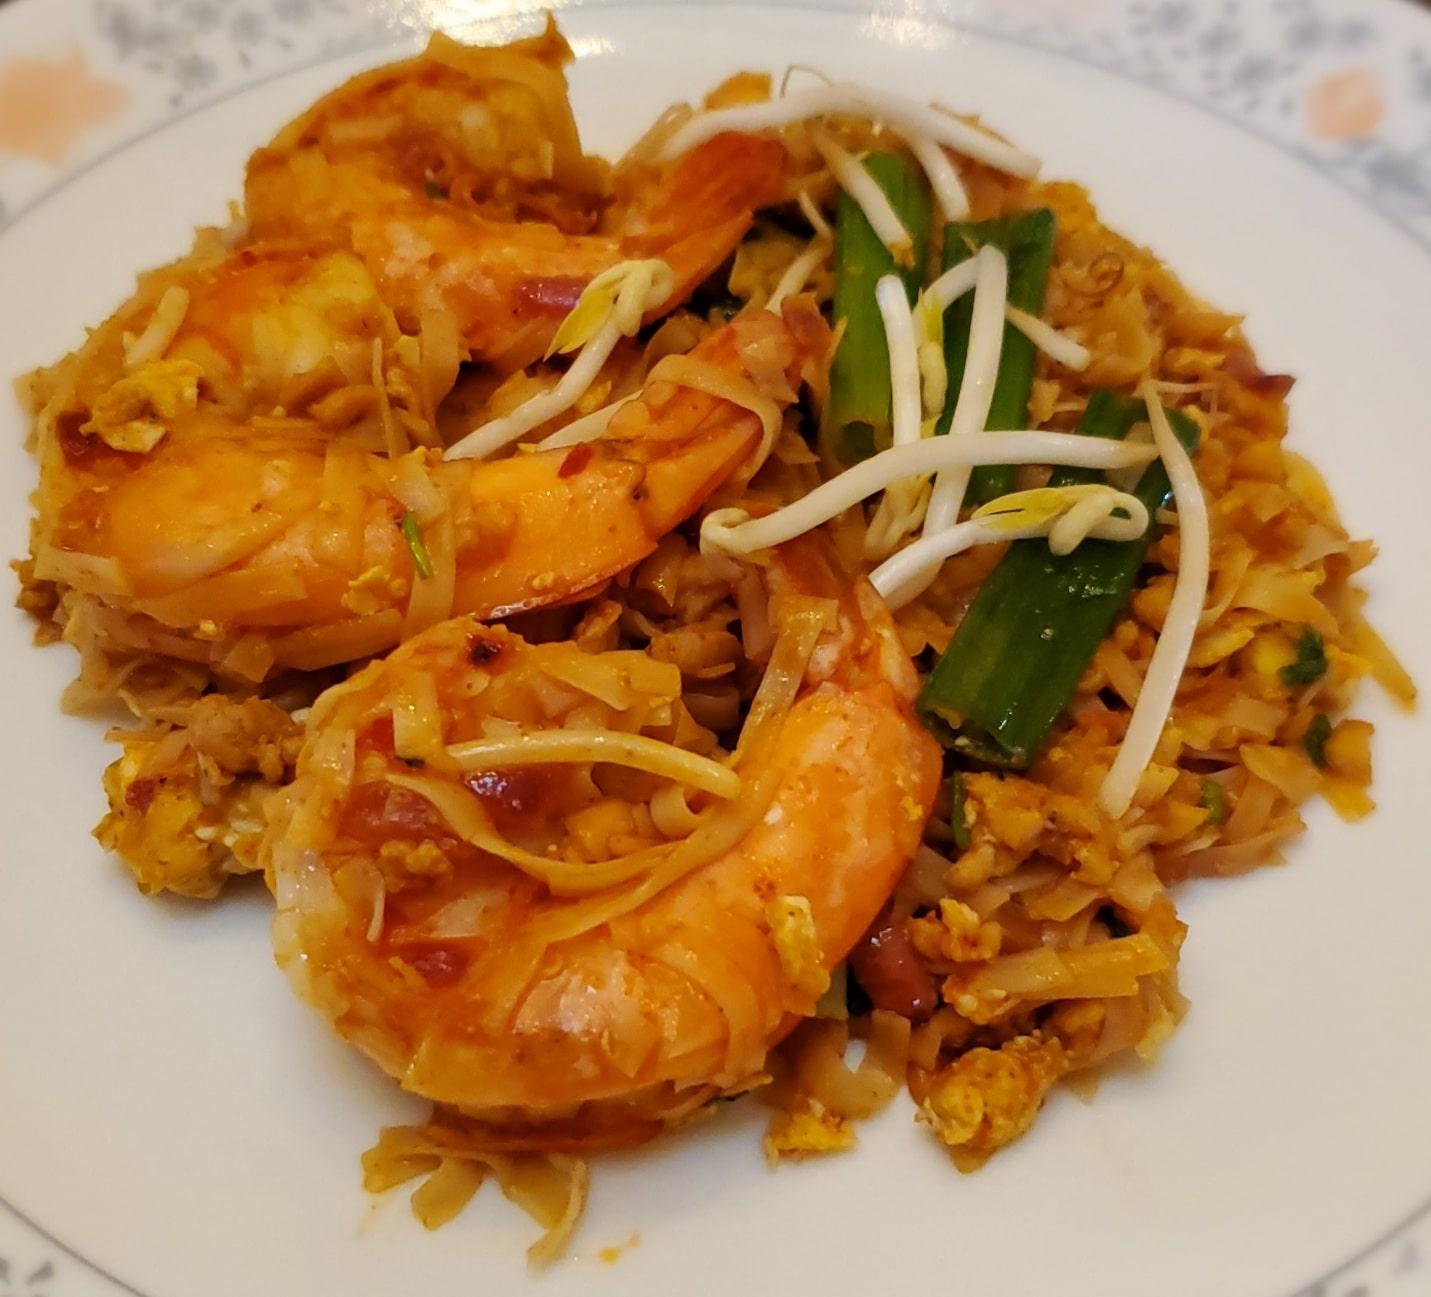 keto pad thai  shirataki noodles make it possible  keto